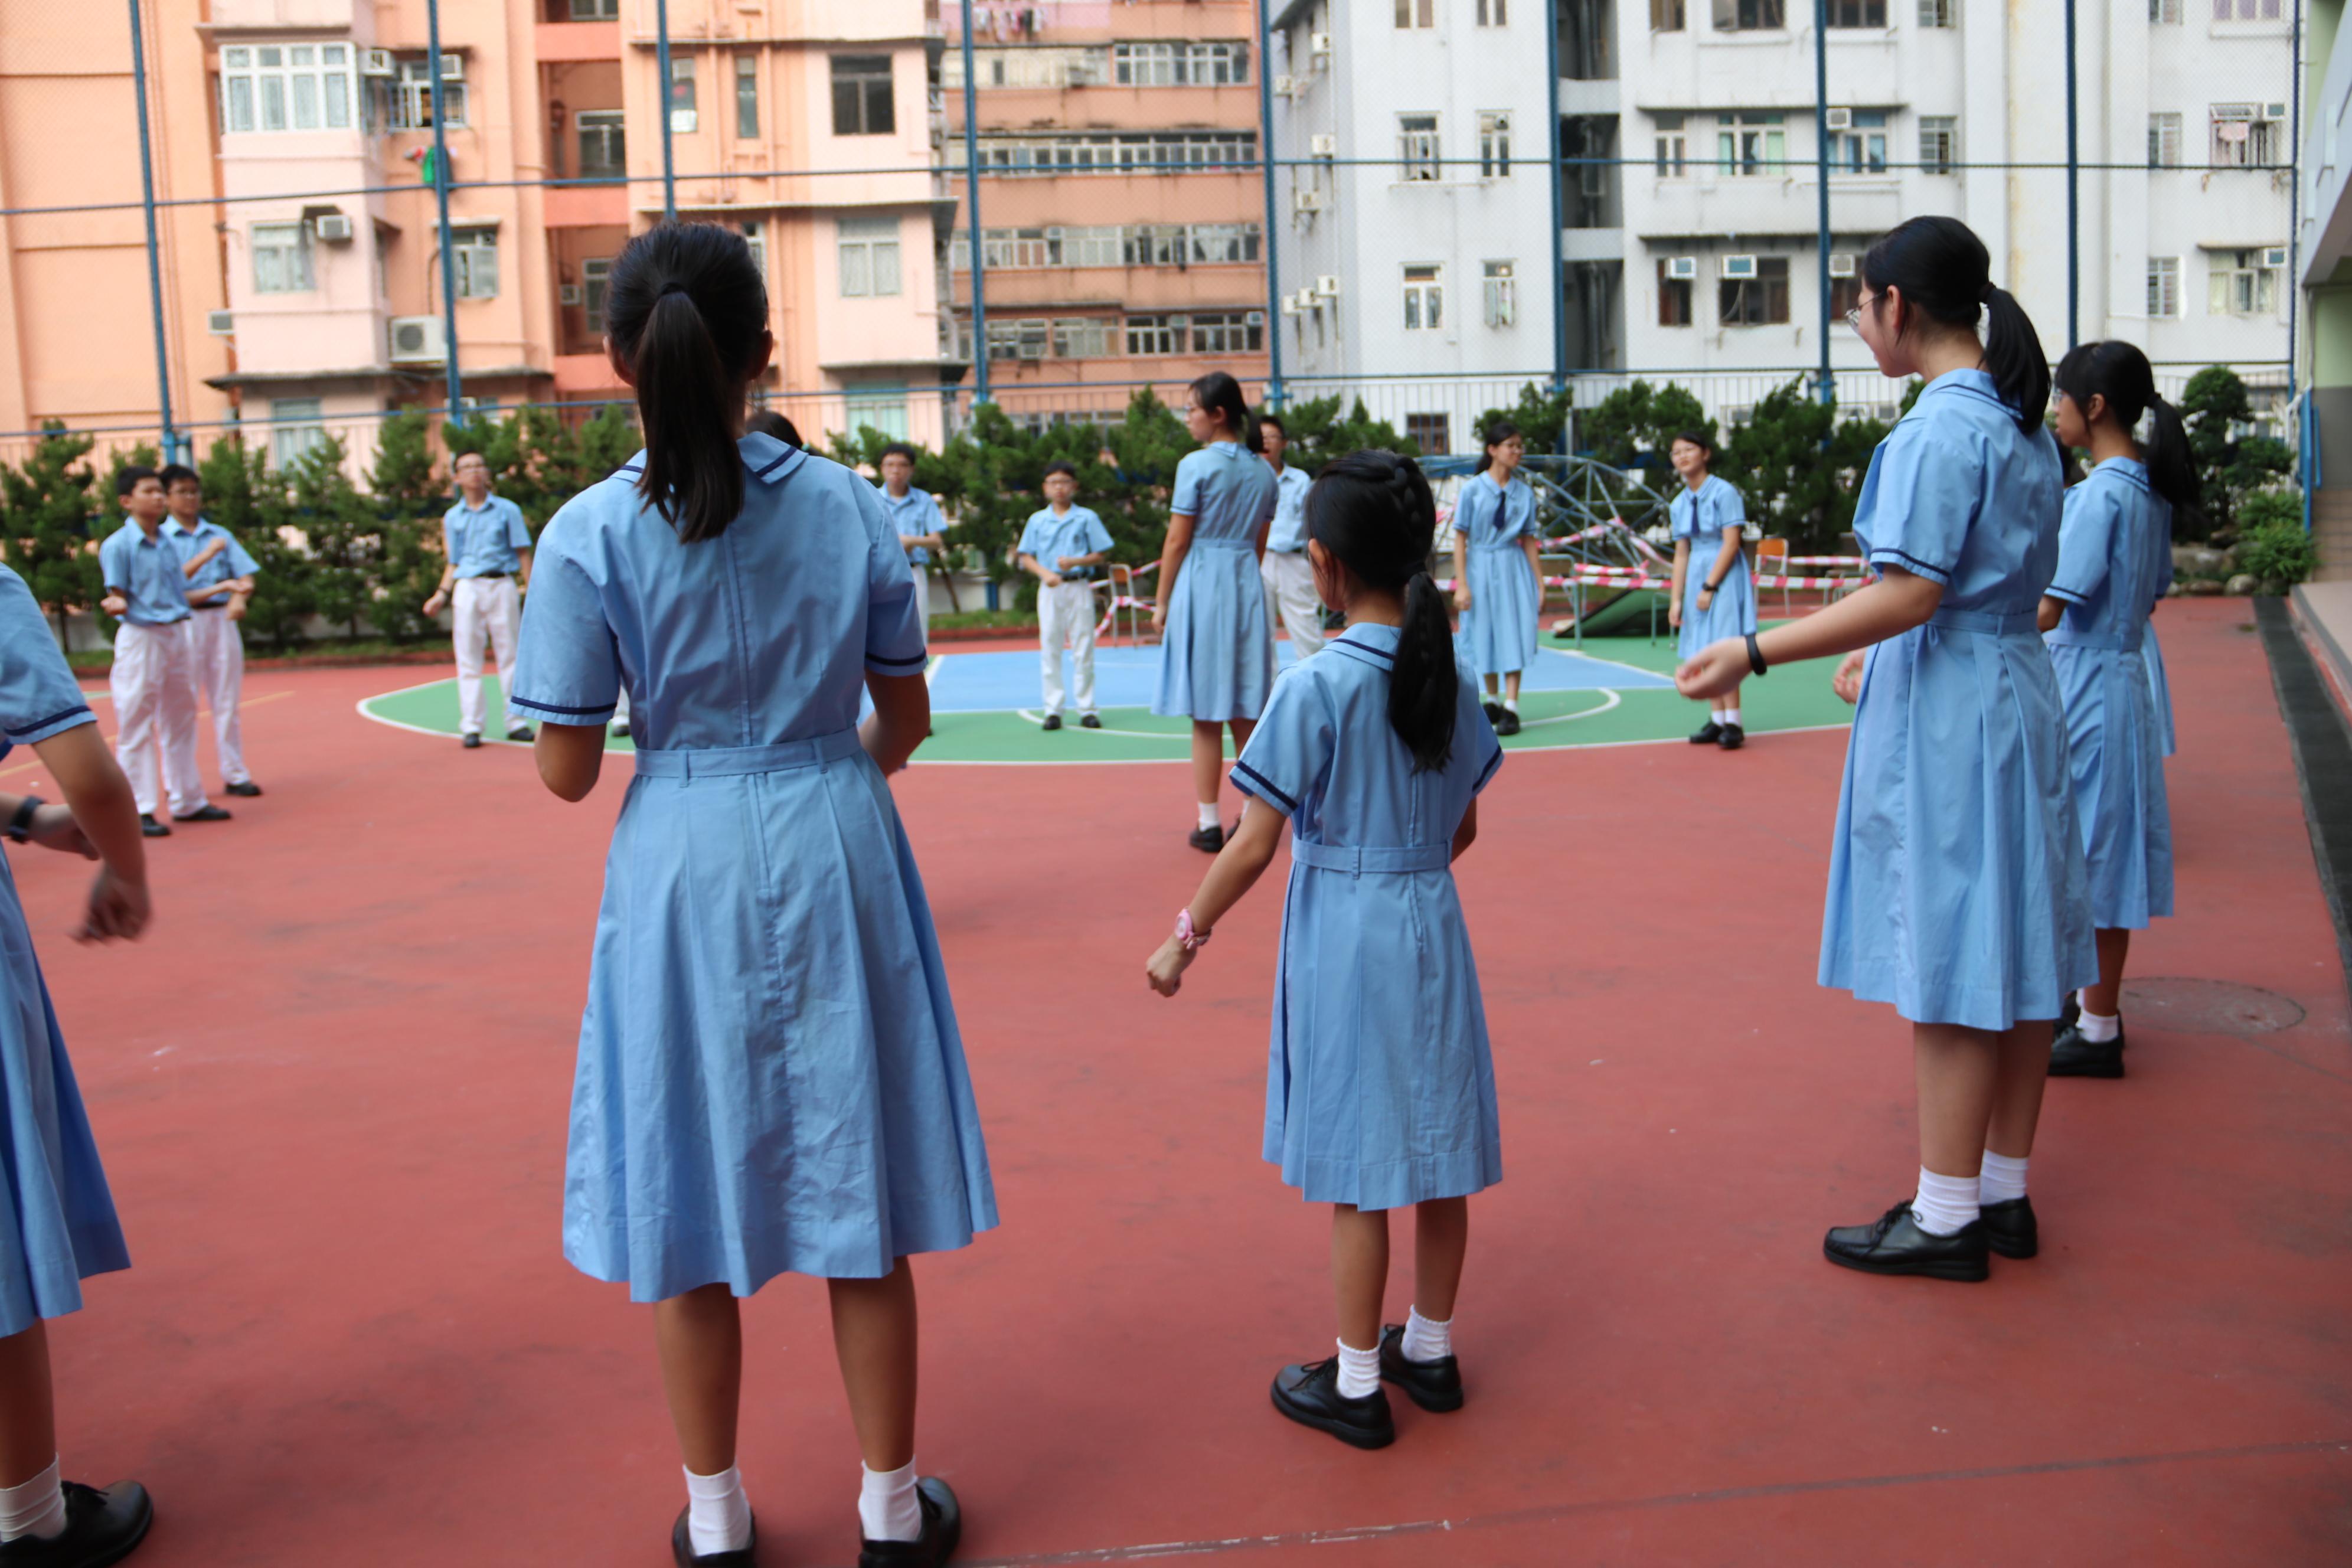 http://npc.edu.hk/sites/default/files/img_7777.jpg